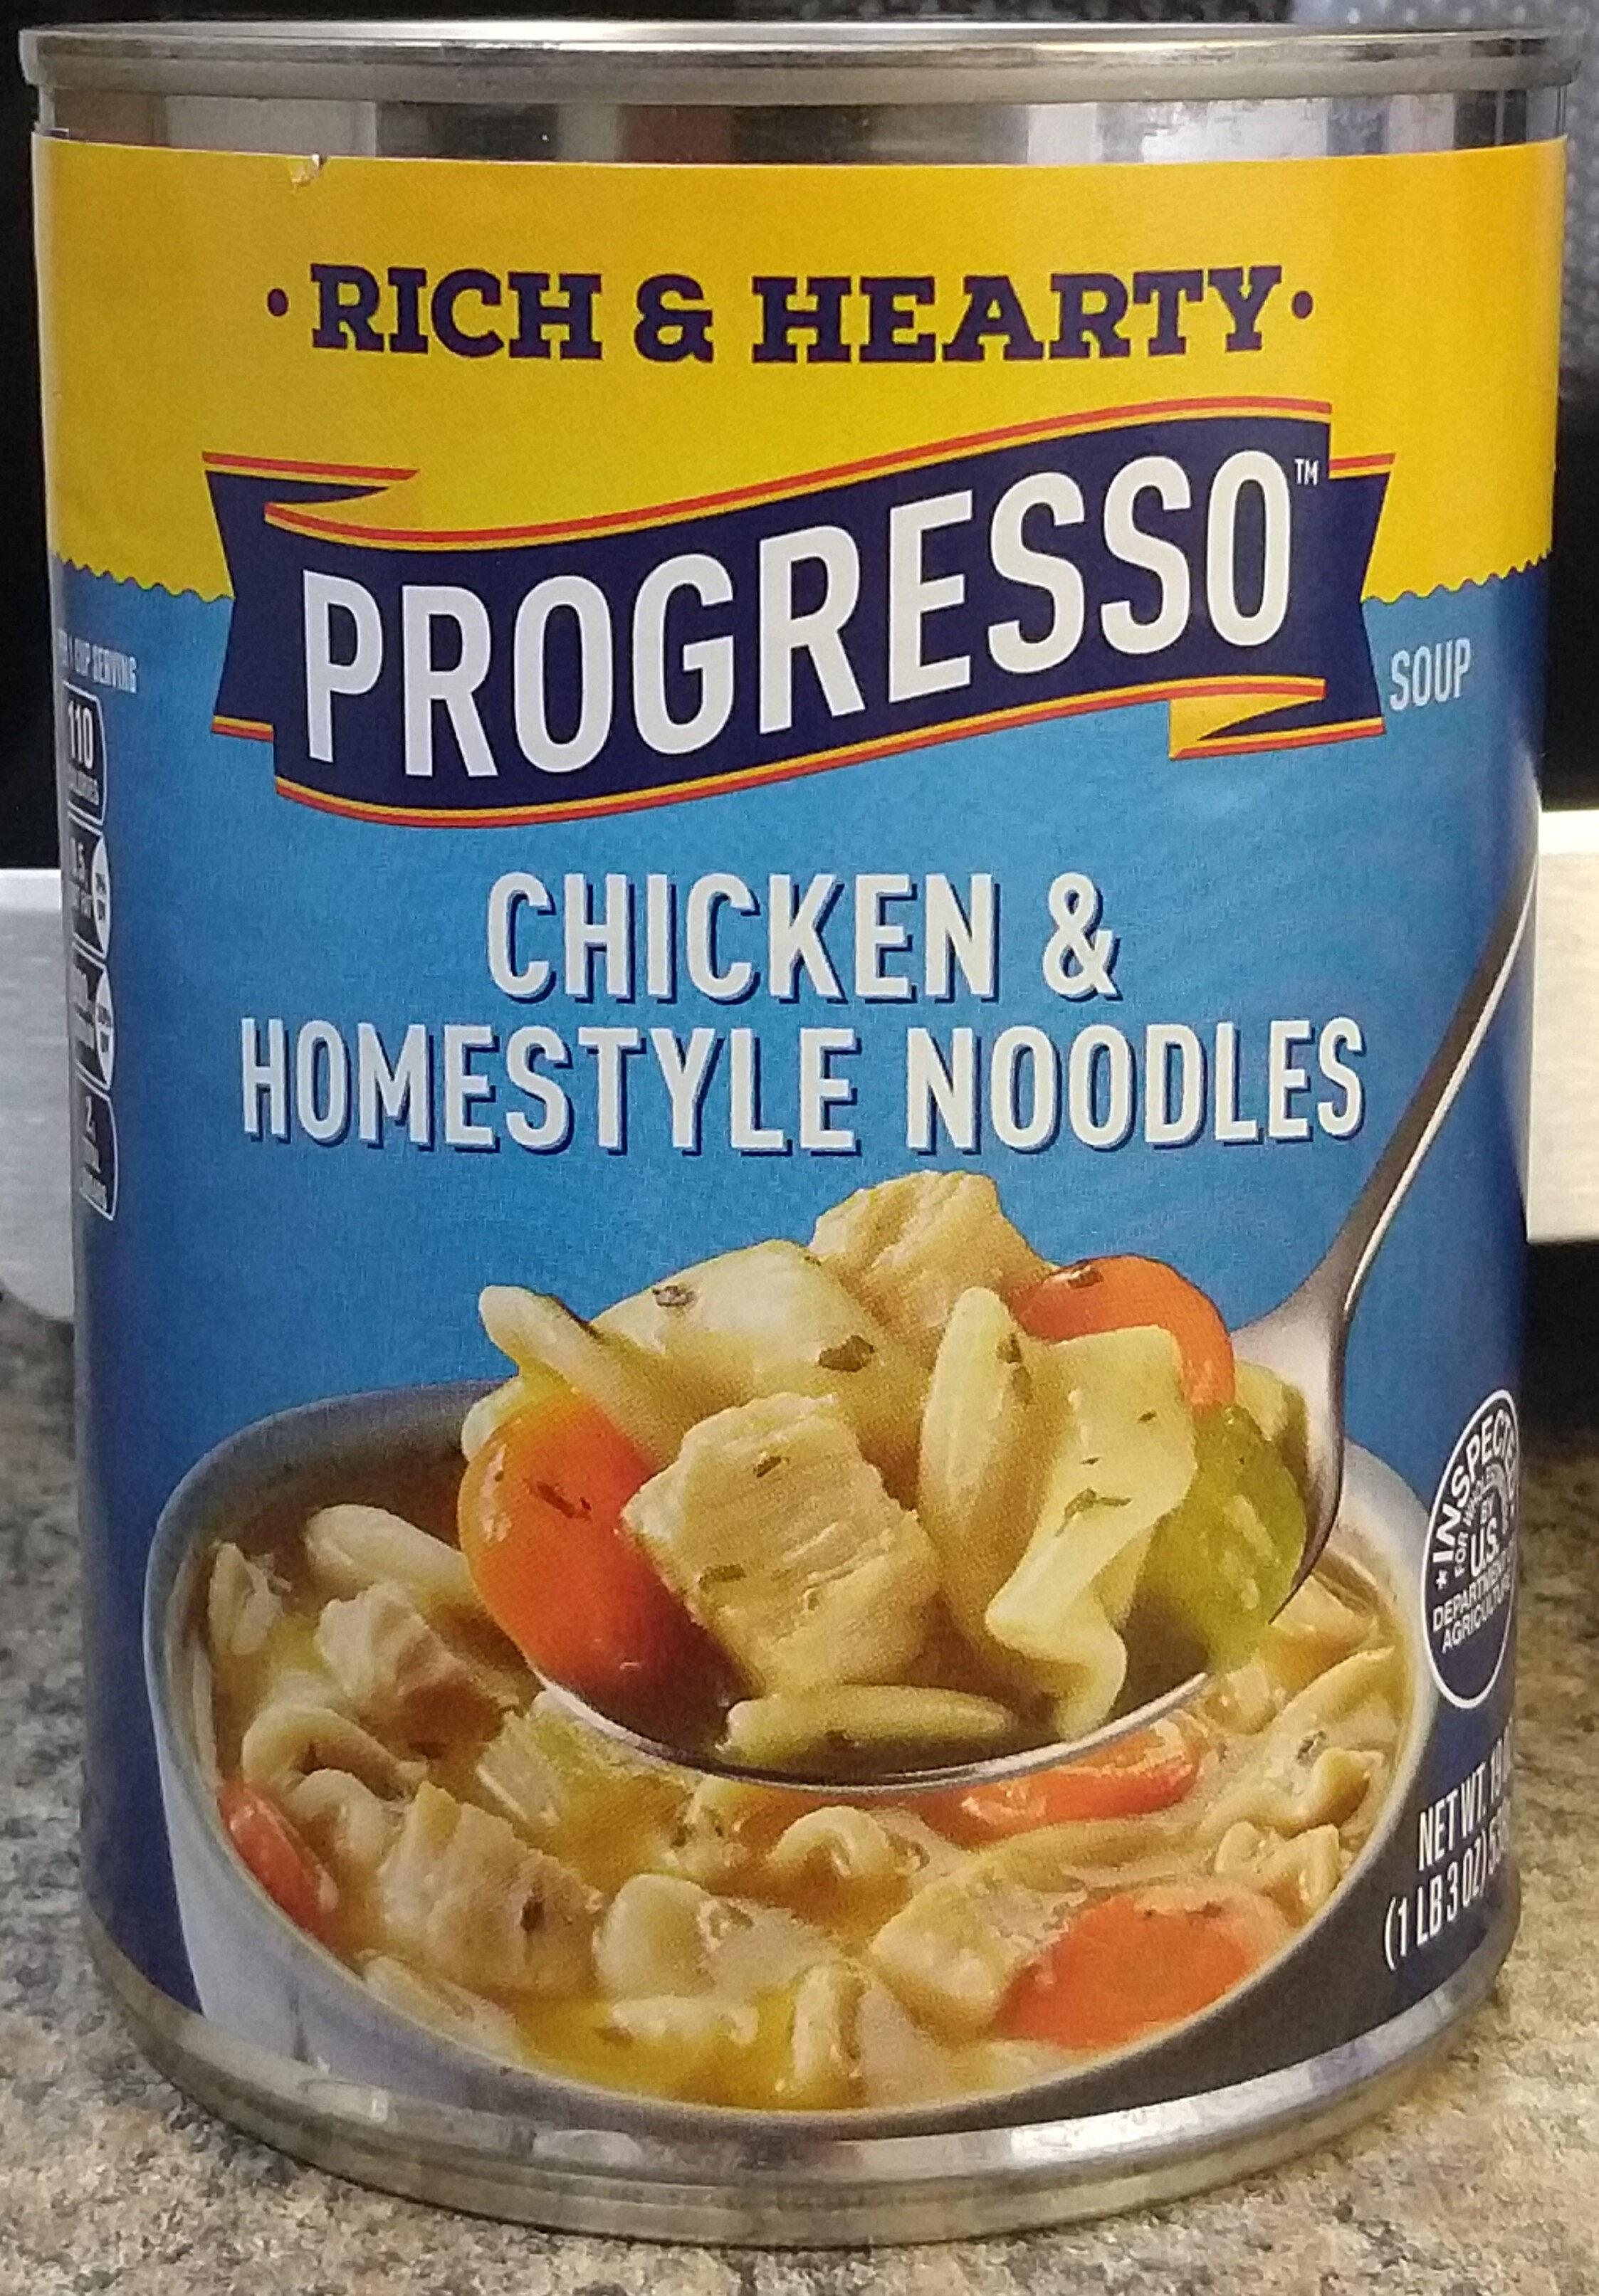 Progresso Rich & Hearty Chicken & Homestyle Noodles Soup - Product - en